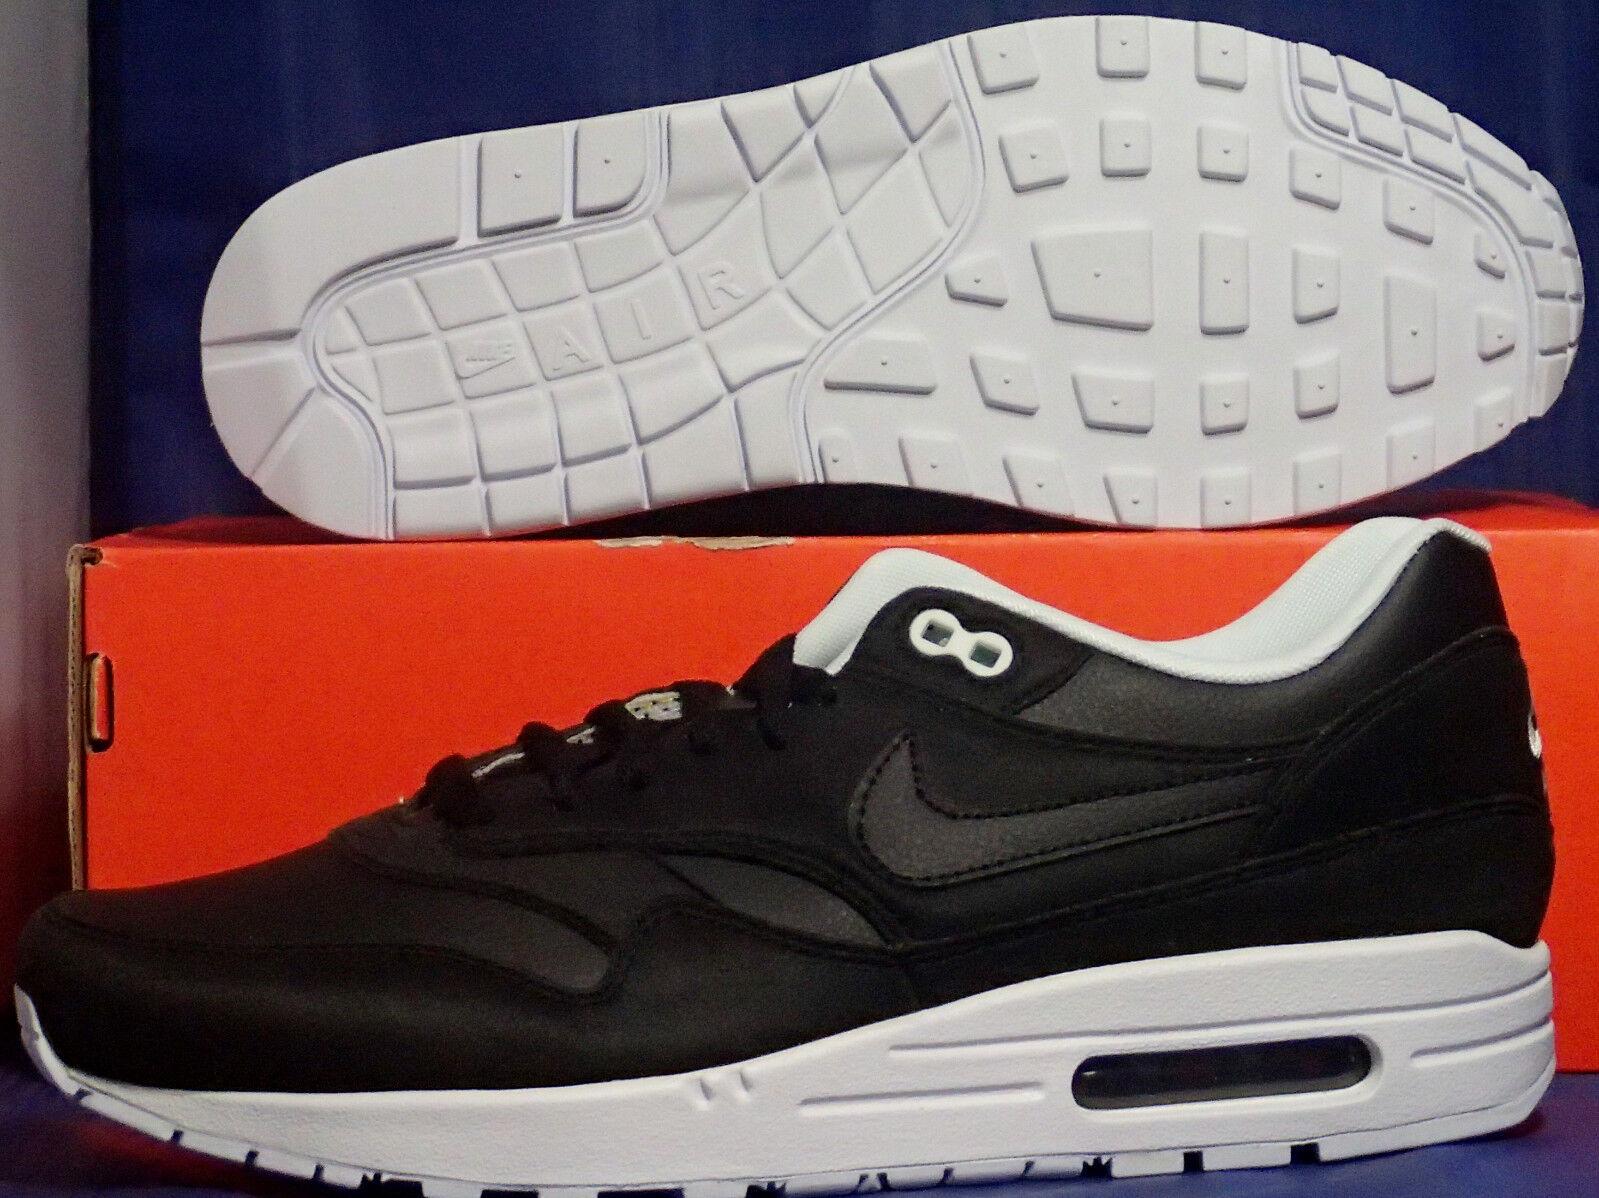 Nike Air Max 1 Identifikation Schwarz Weiß Sz 9.5 (433213-999) (433213-999) (433213-999) 12d541